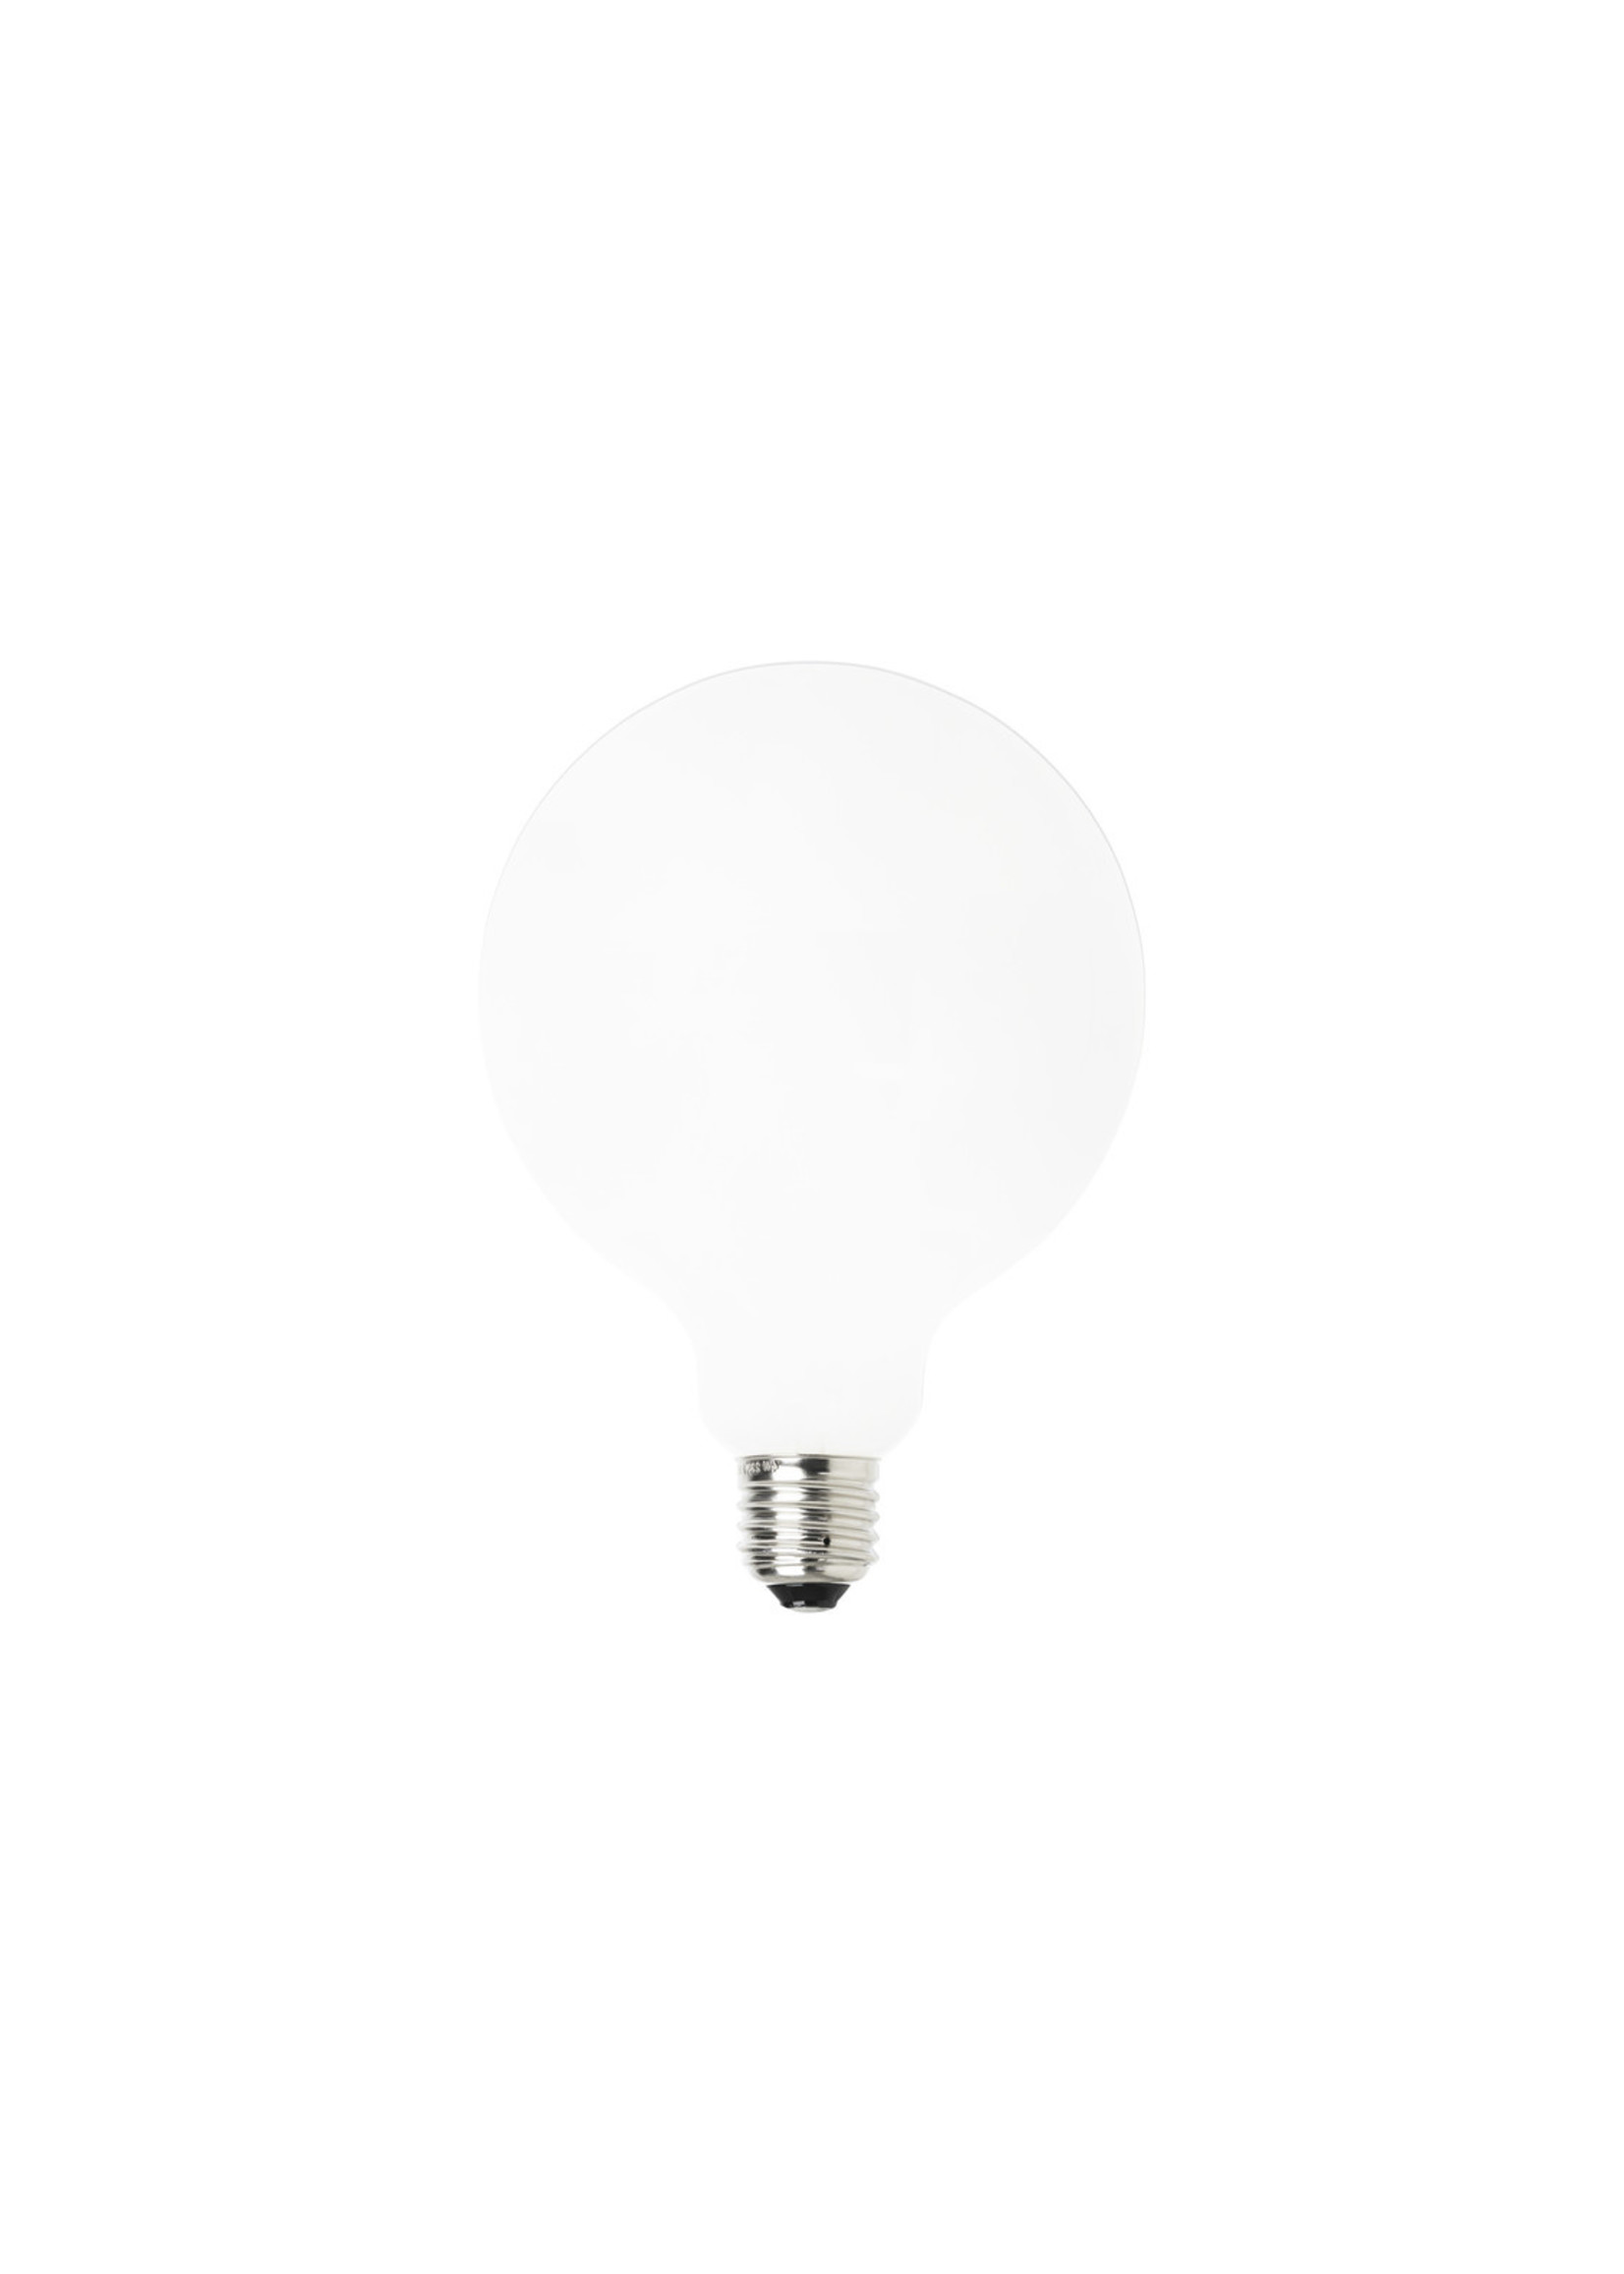 ferm LIVING ferm LIVING Lighting - Opal LED 4W - Large